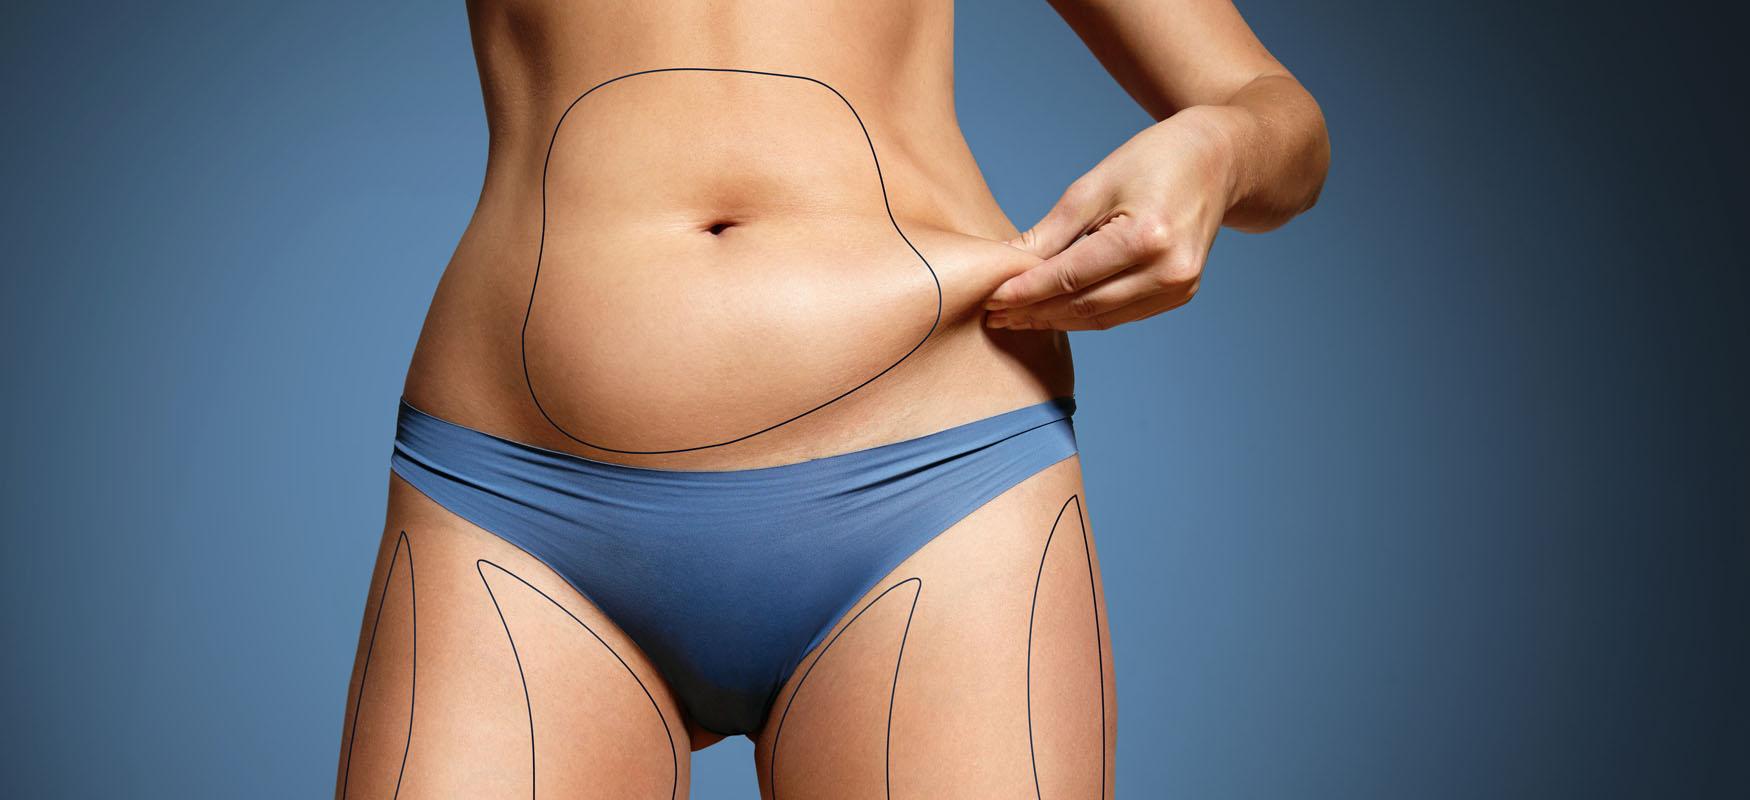 Liposukcja brzucha inietylkowOT.CO Clinic